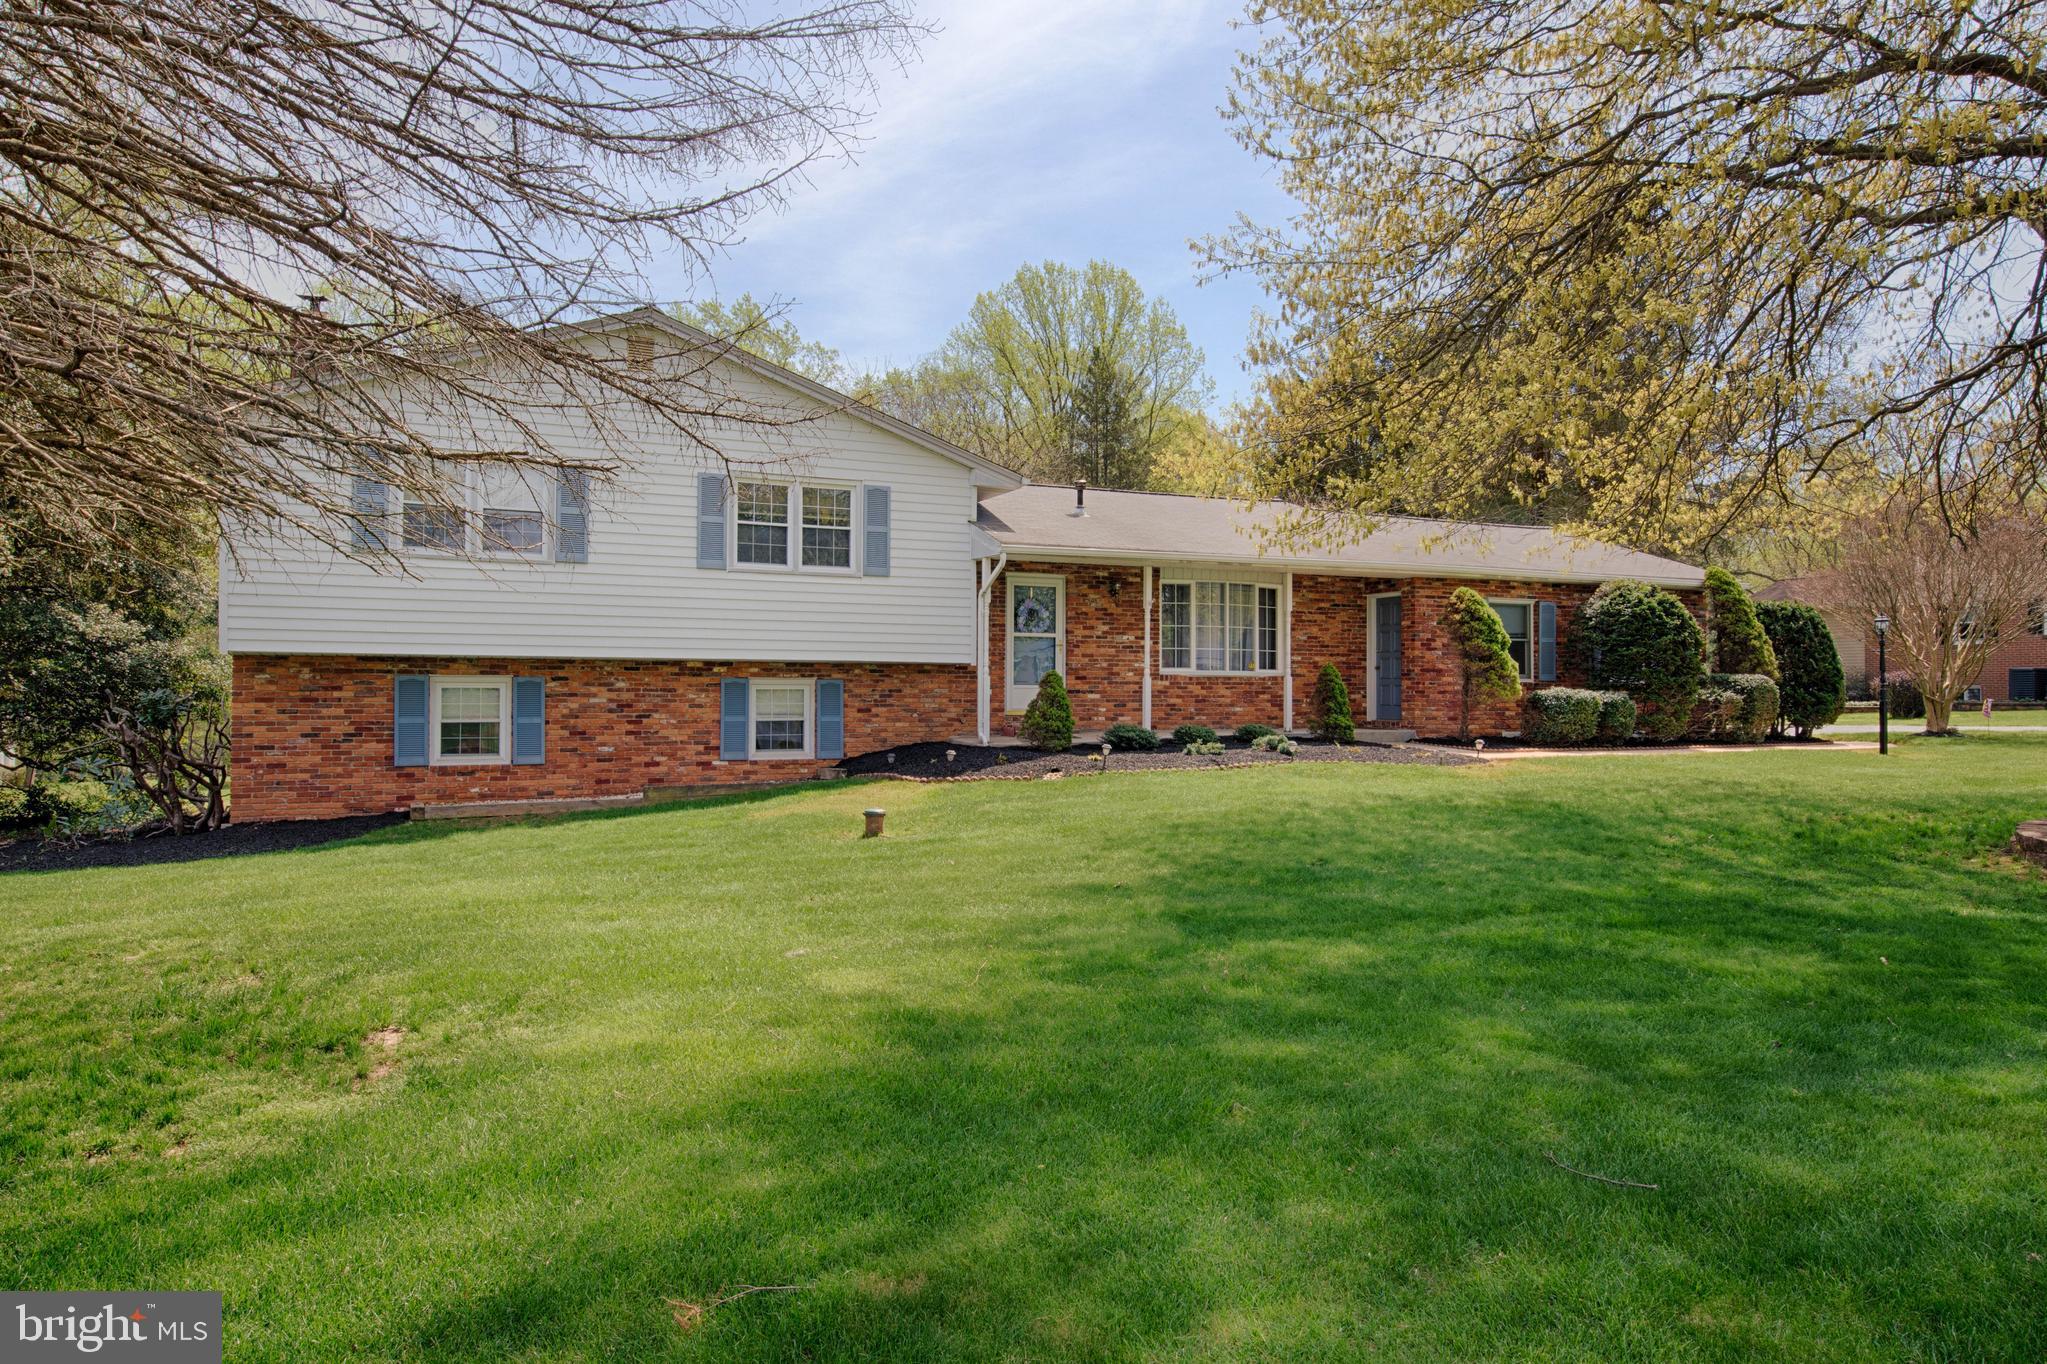 1710 Parkvue Rd, Fallston, MD, 21047